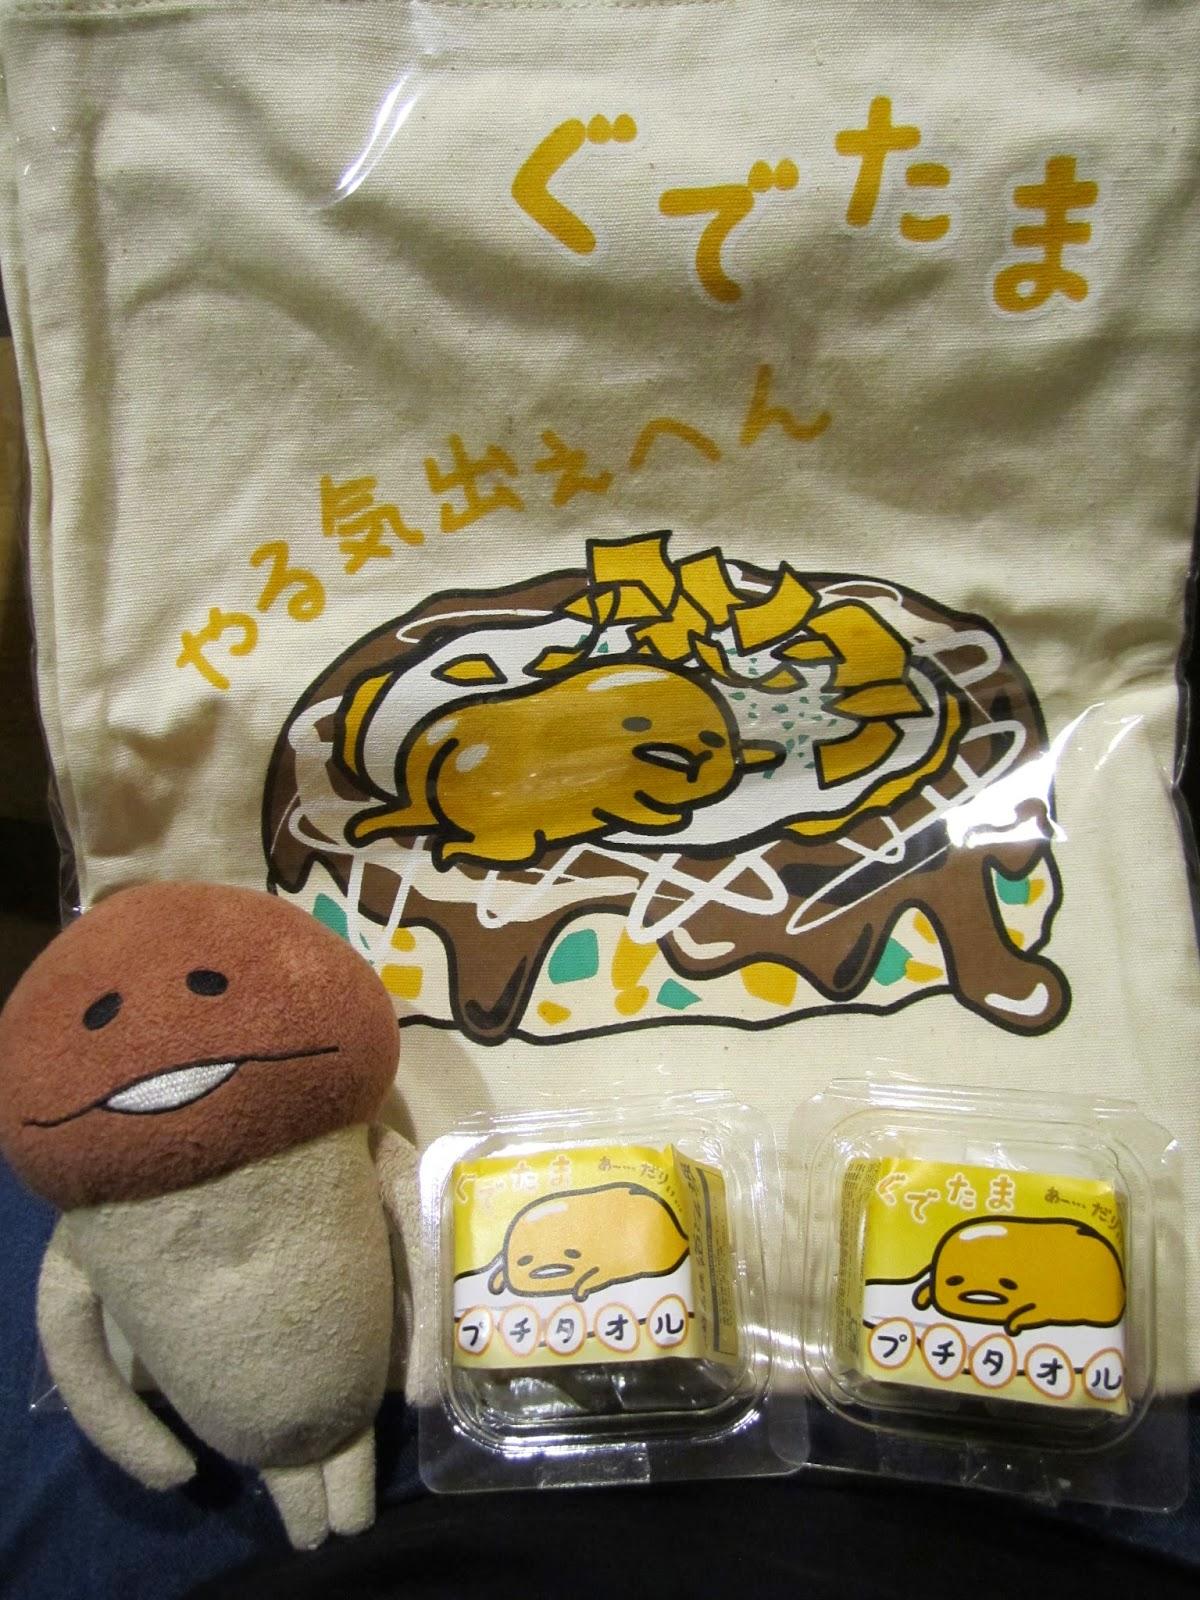 Gudetama x Dohtonbori Collaboration Campaign Goods 十和田市 ぐでたまx道頓堀コラブキャンペインプレゼント